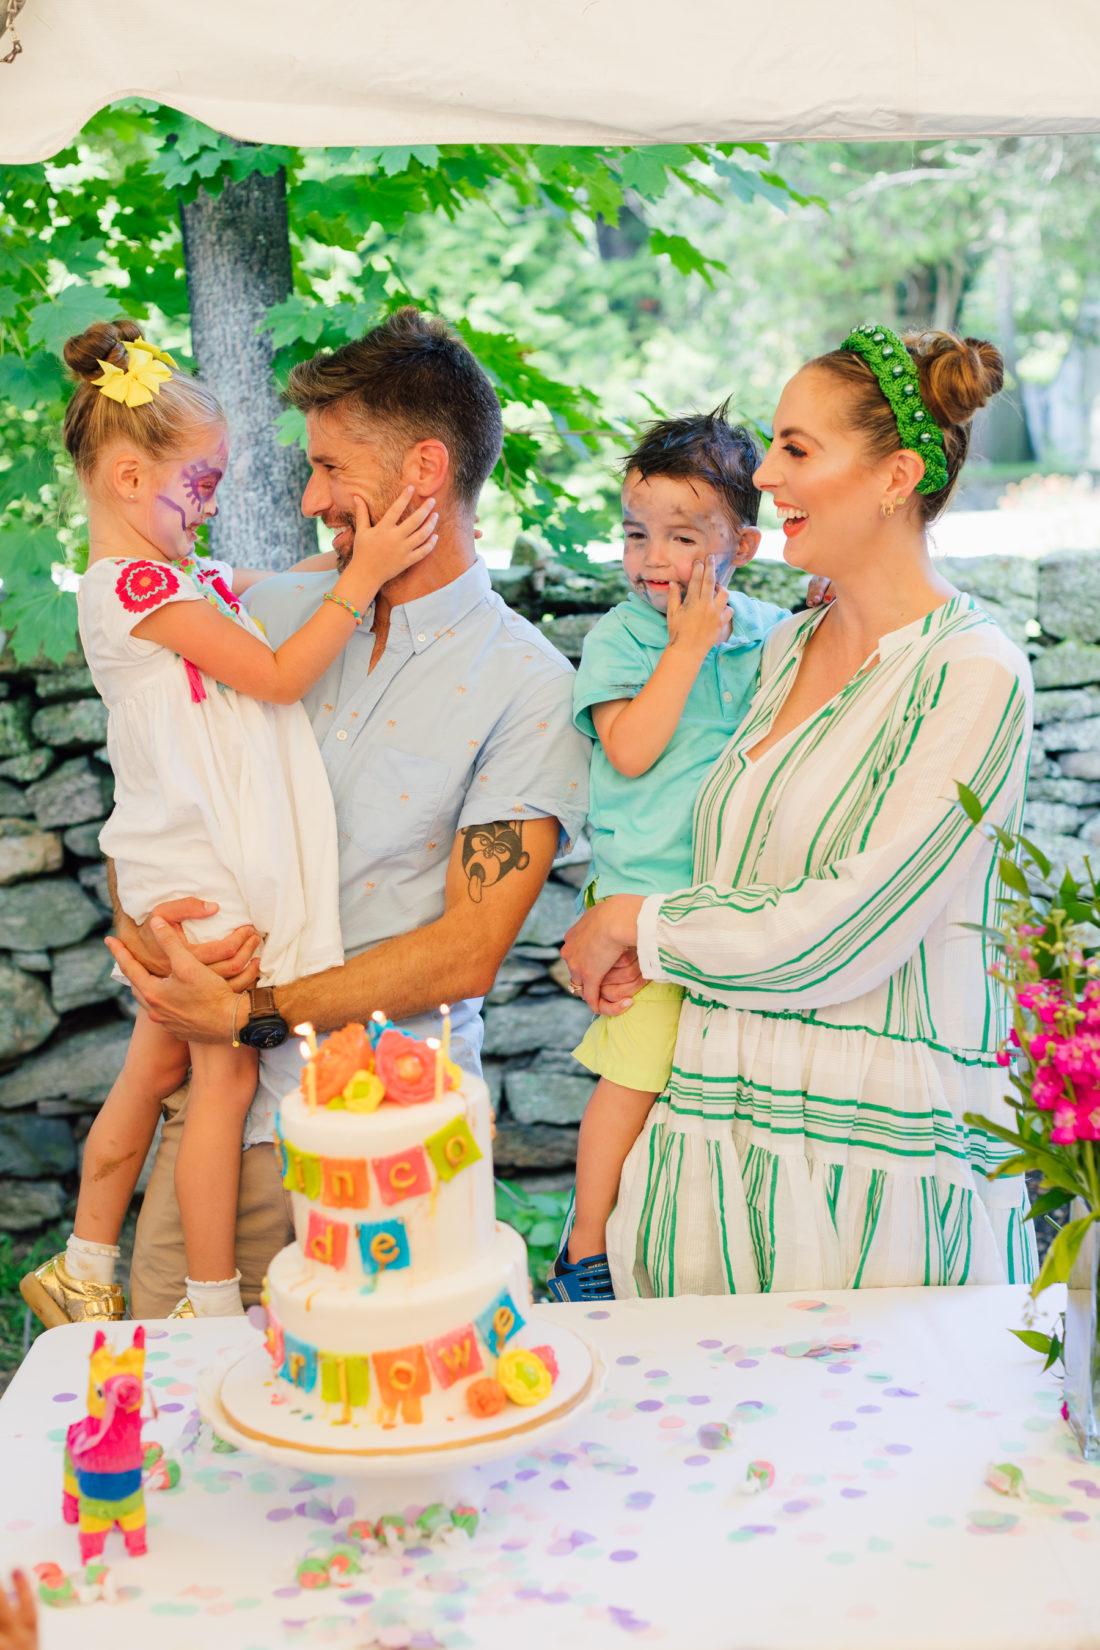 The Martino family singing Happy Birthday to daughter Marlowe Martino's Cinco de Marlowe themed 5th birthday fiesta